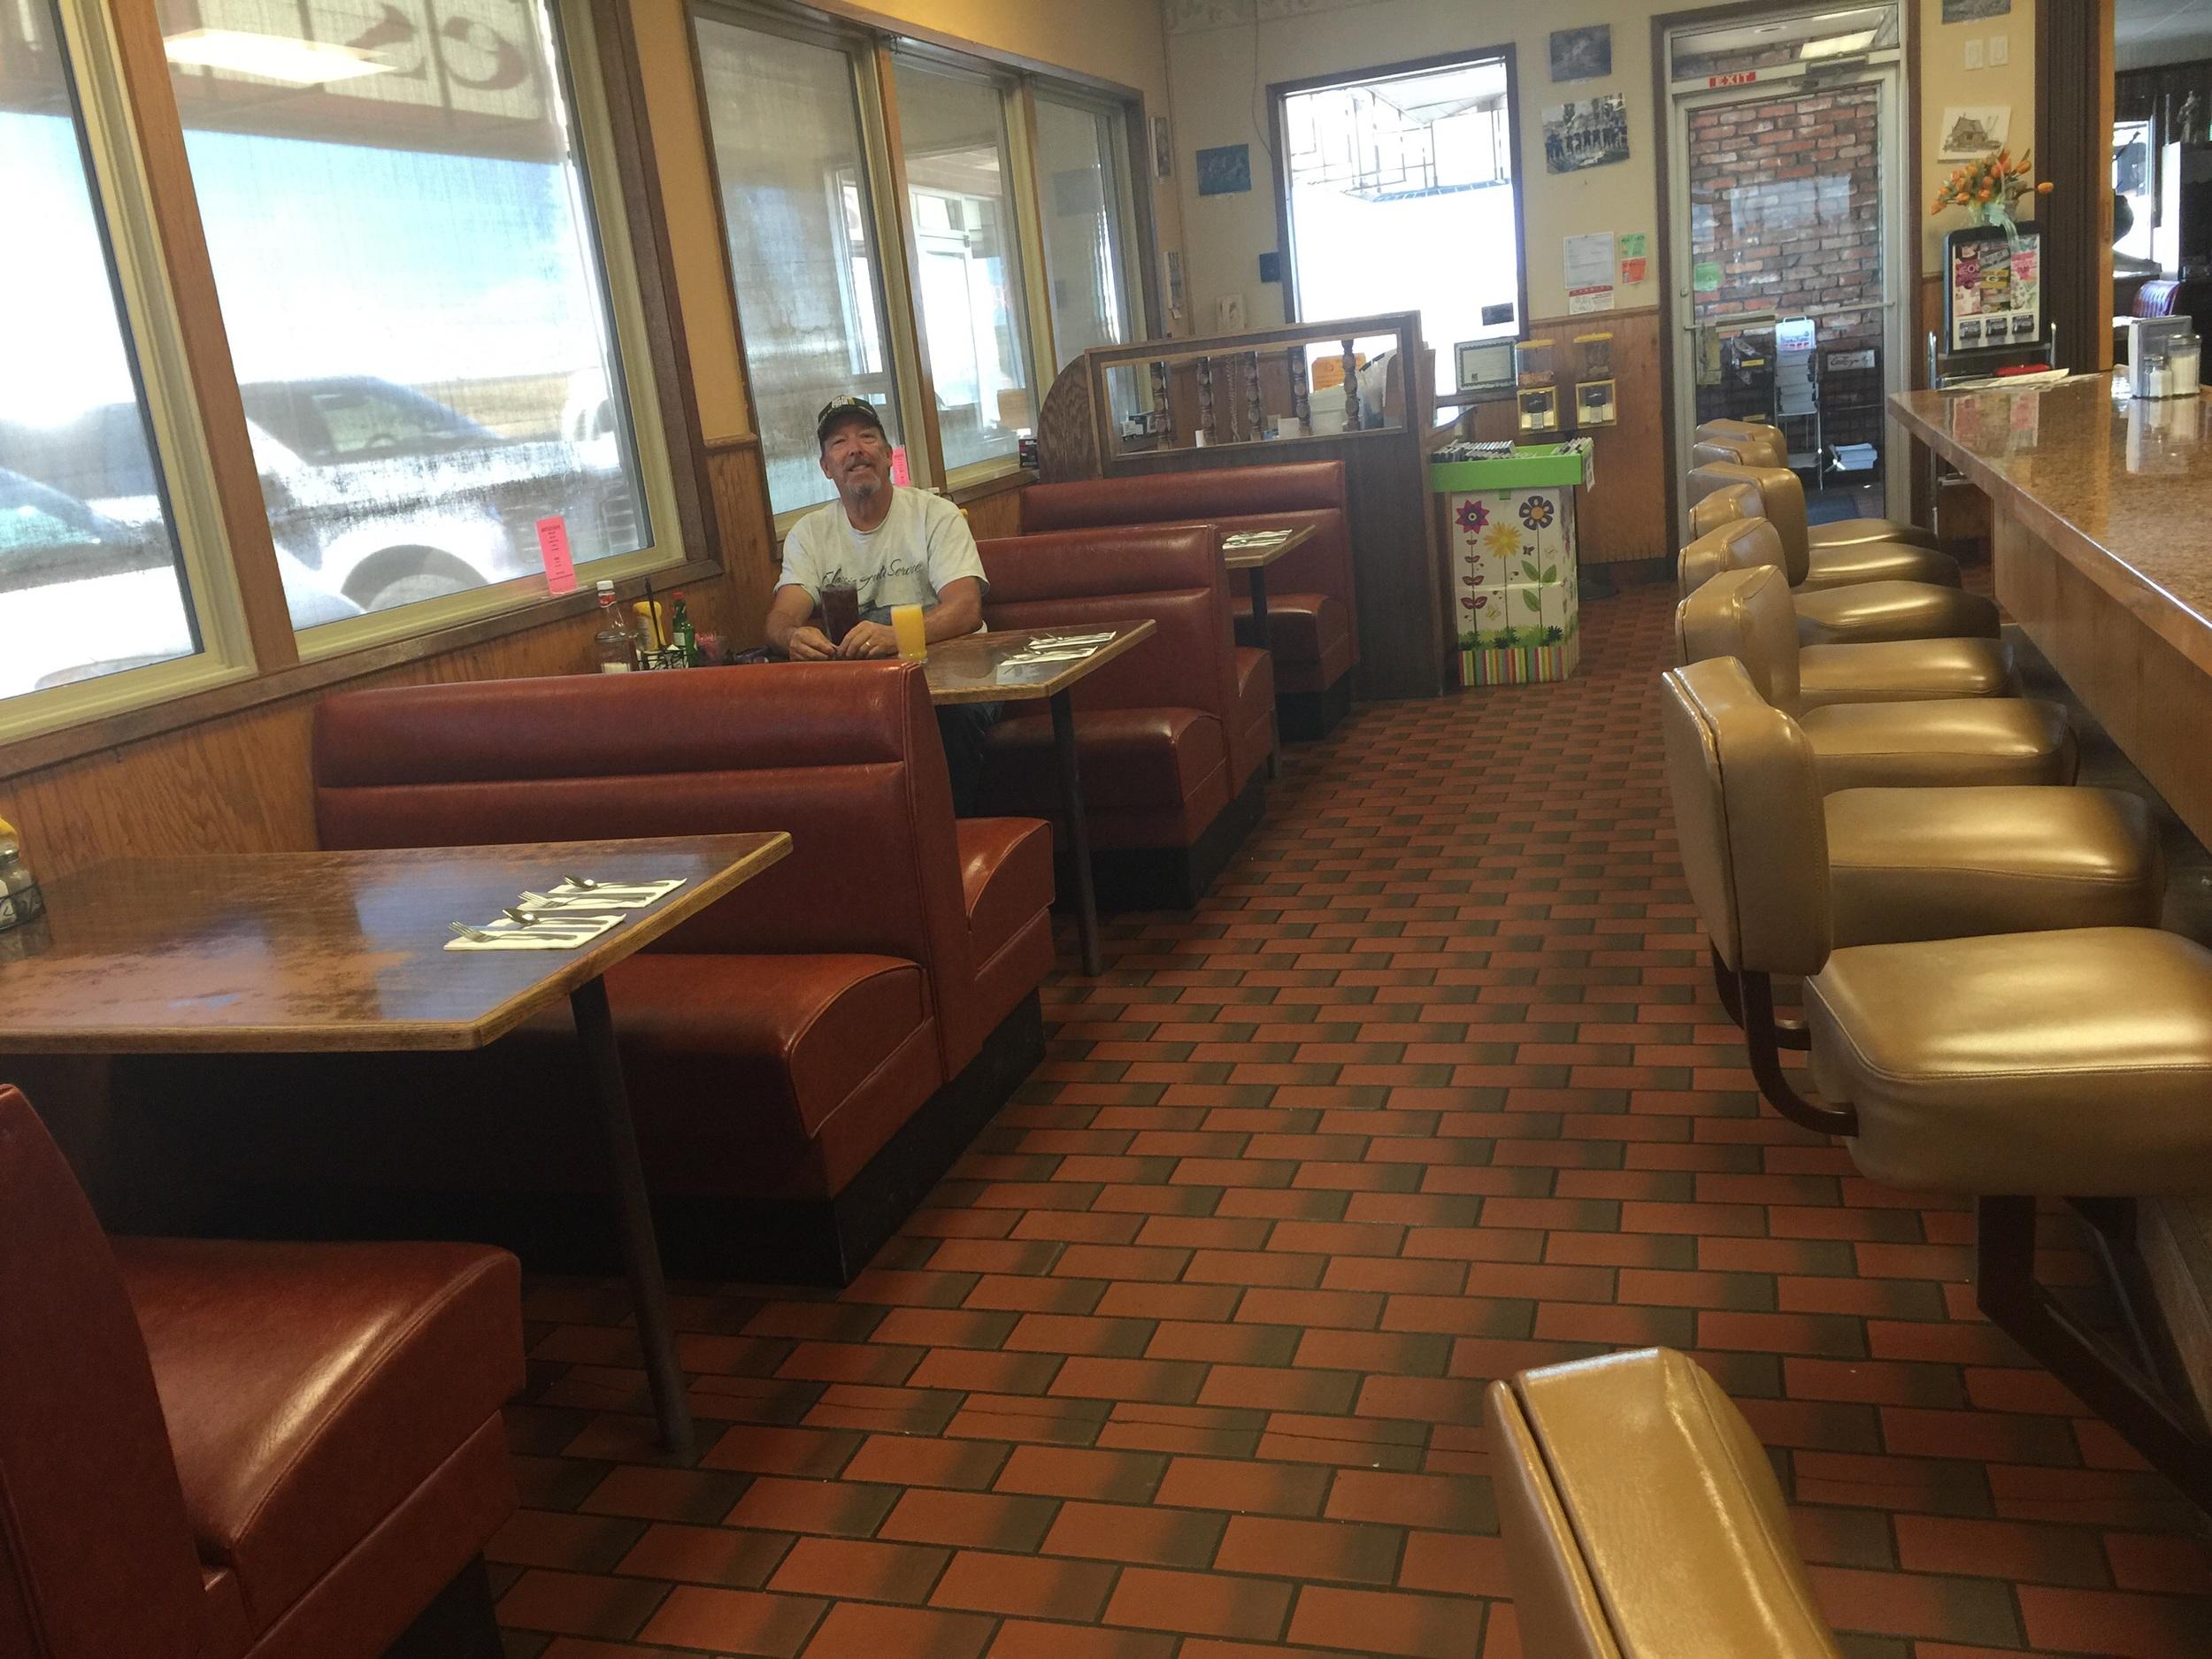 Brad eating at Jakes Cafe in Ritzville Washington